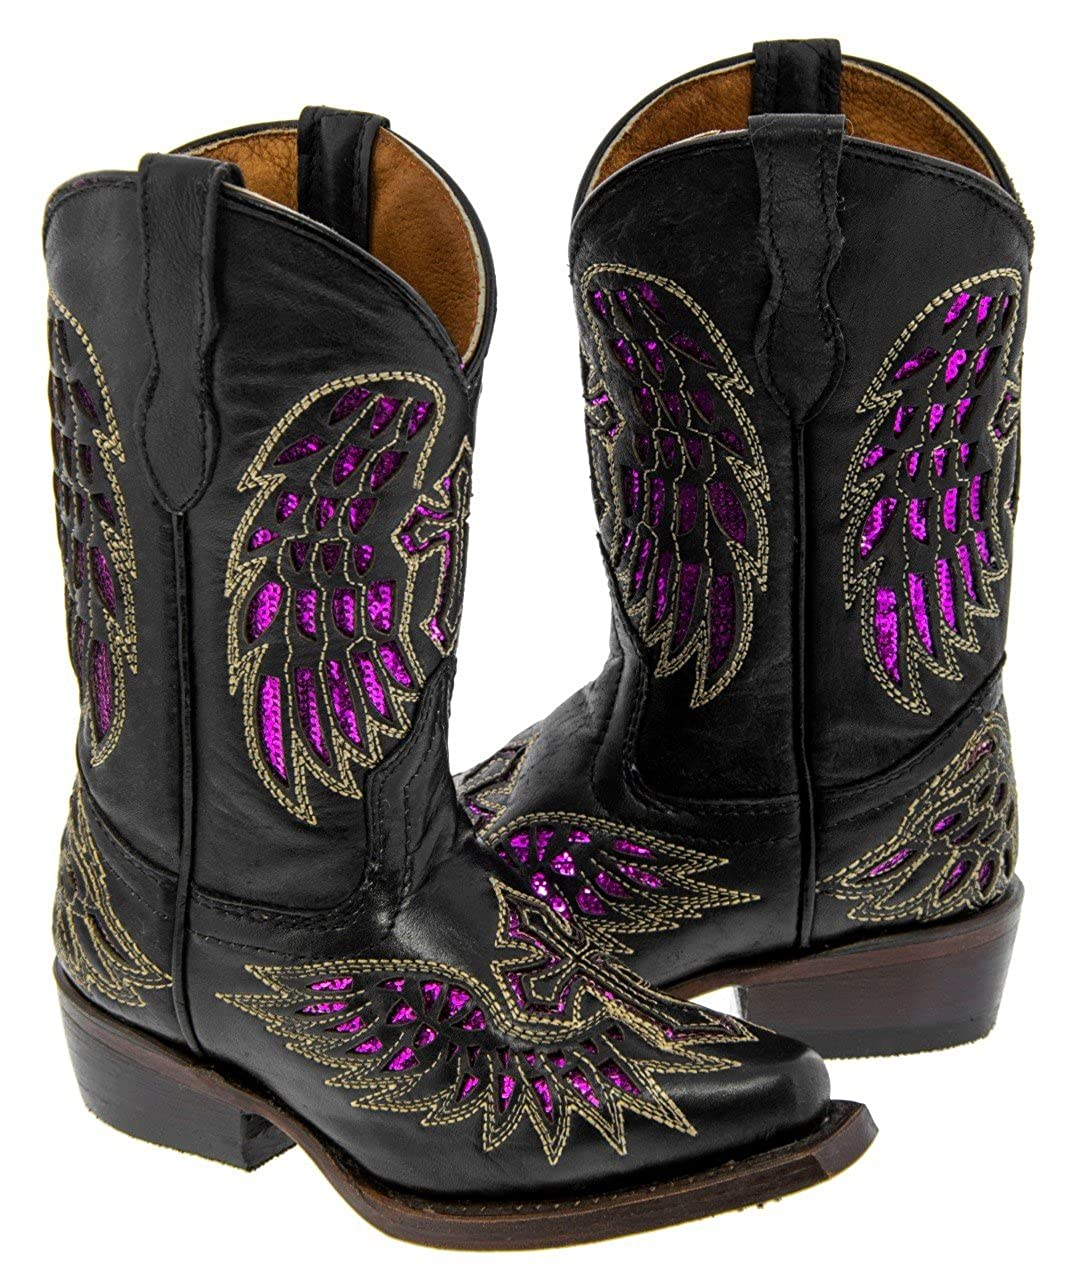 Kids Black /& Fuchsia Cross Wings Leather Cowboy Boots Snip Toe Veretta Boots